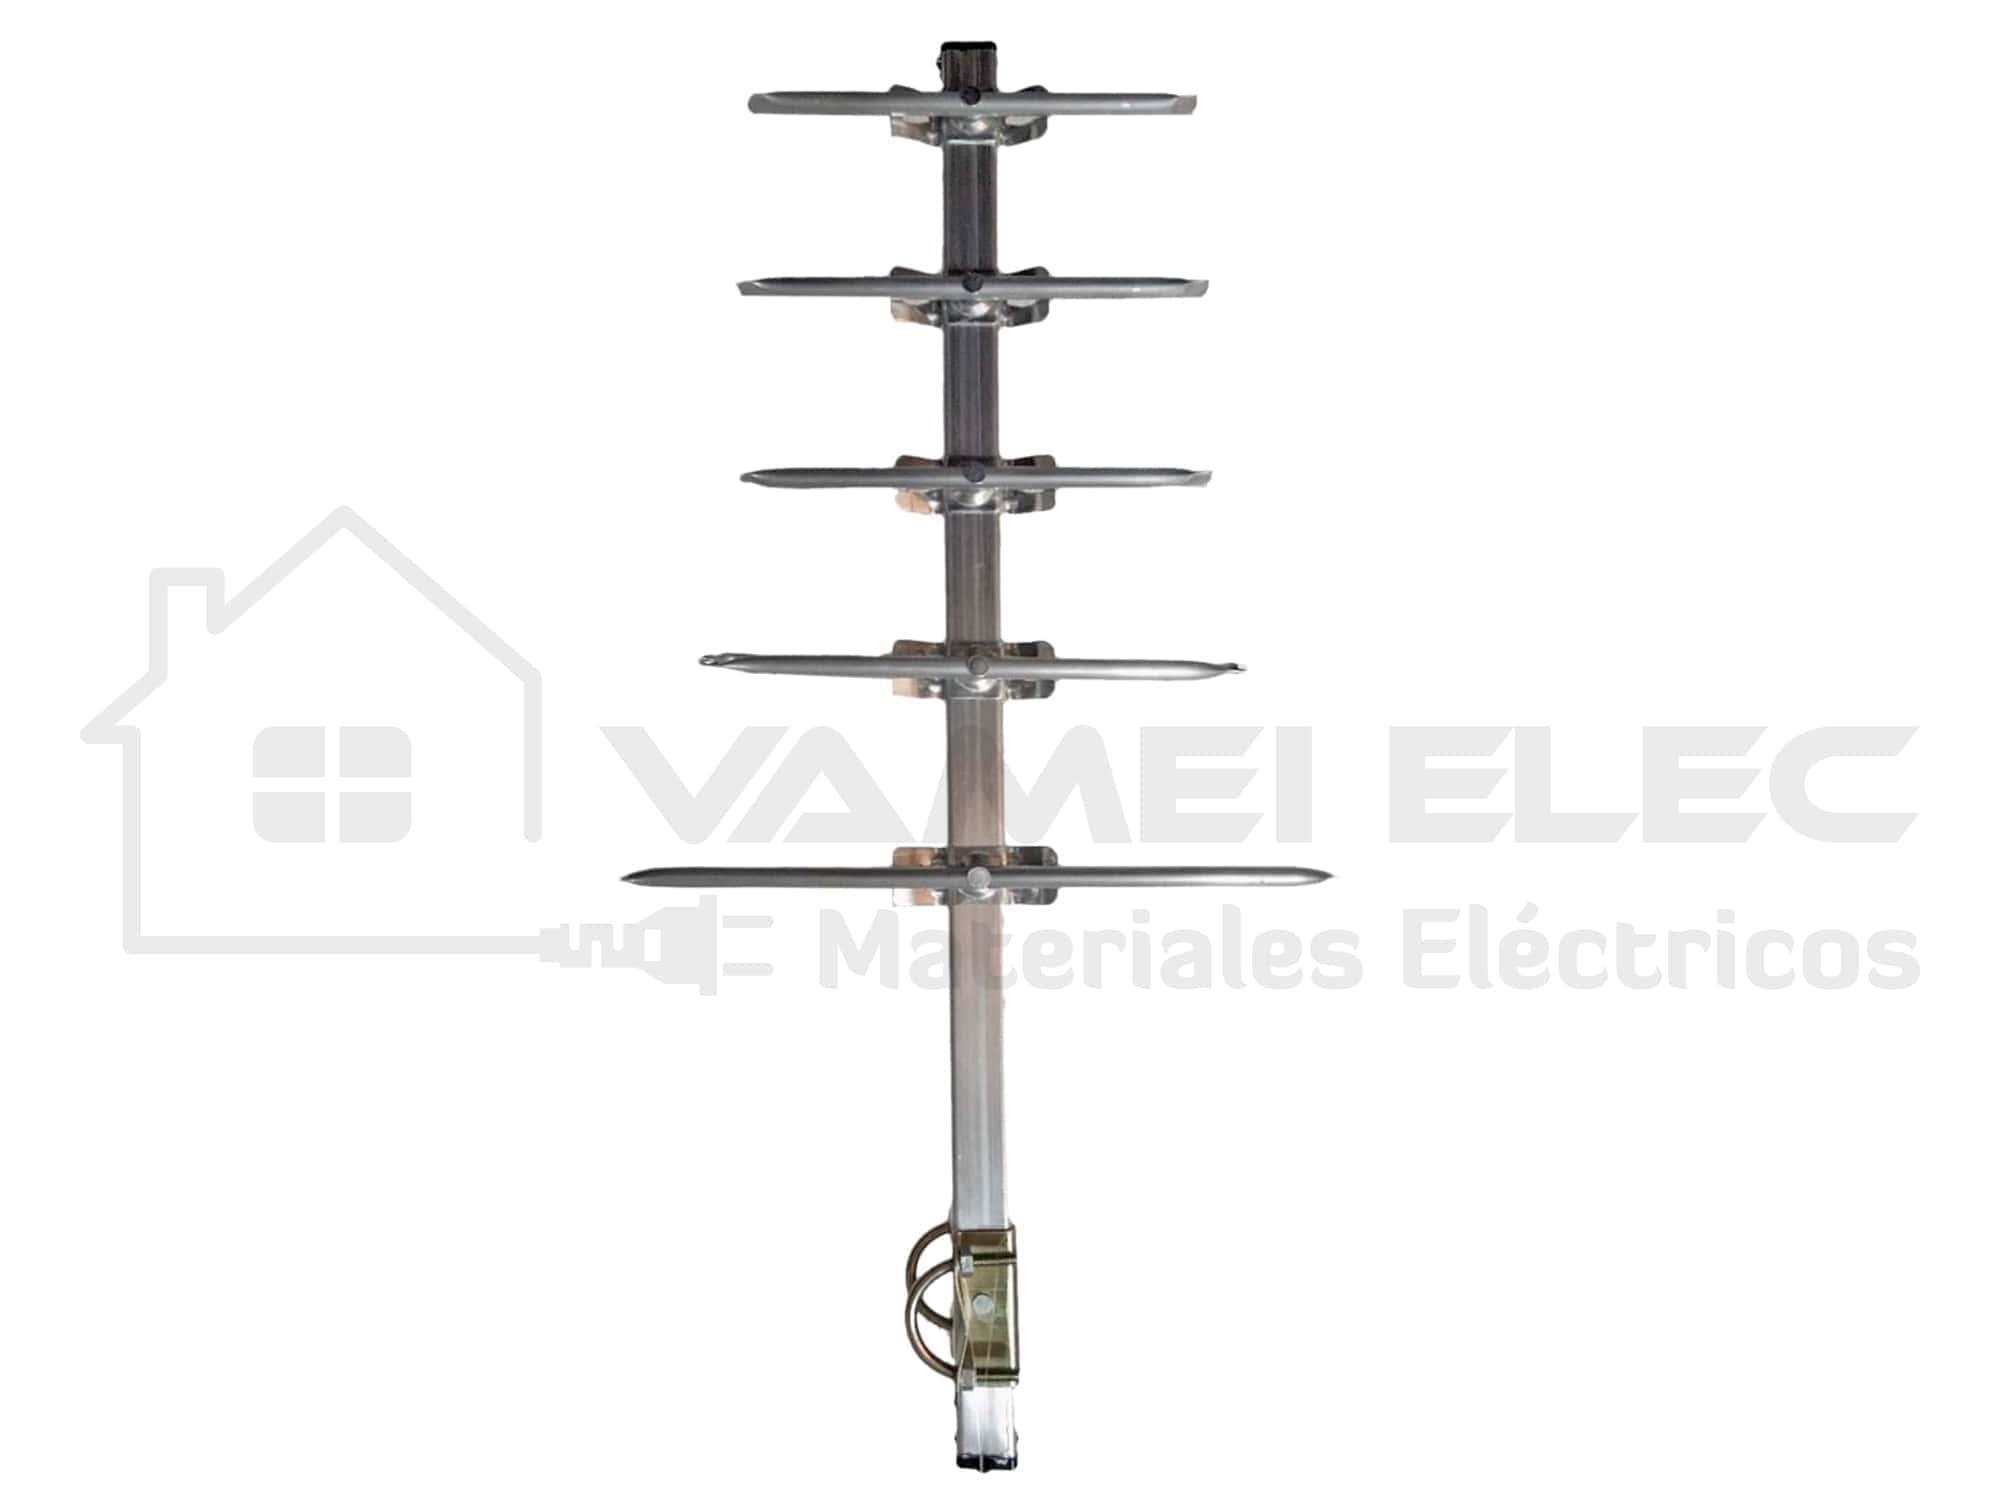 VAMEI Elec - Antenas - Antenas 5 Elementos